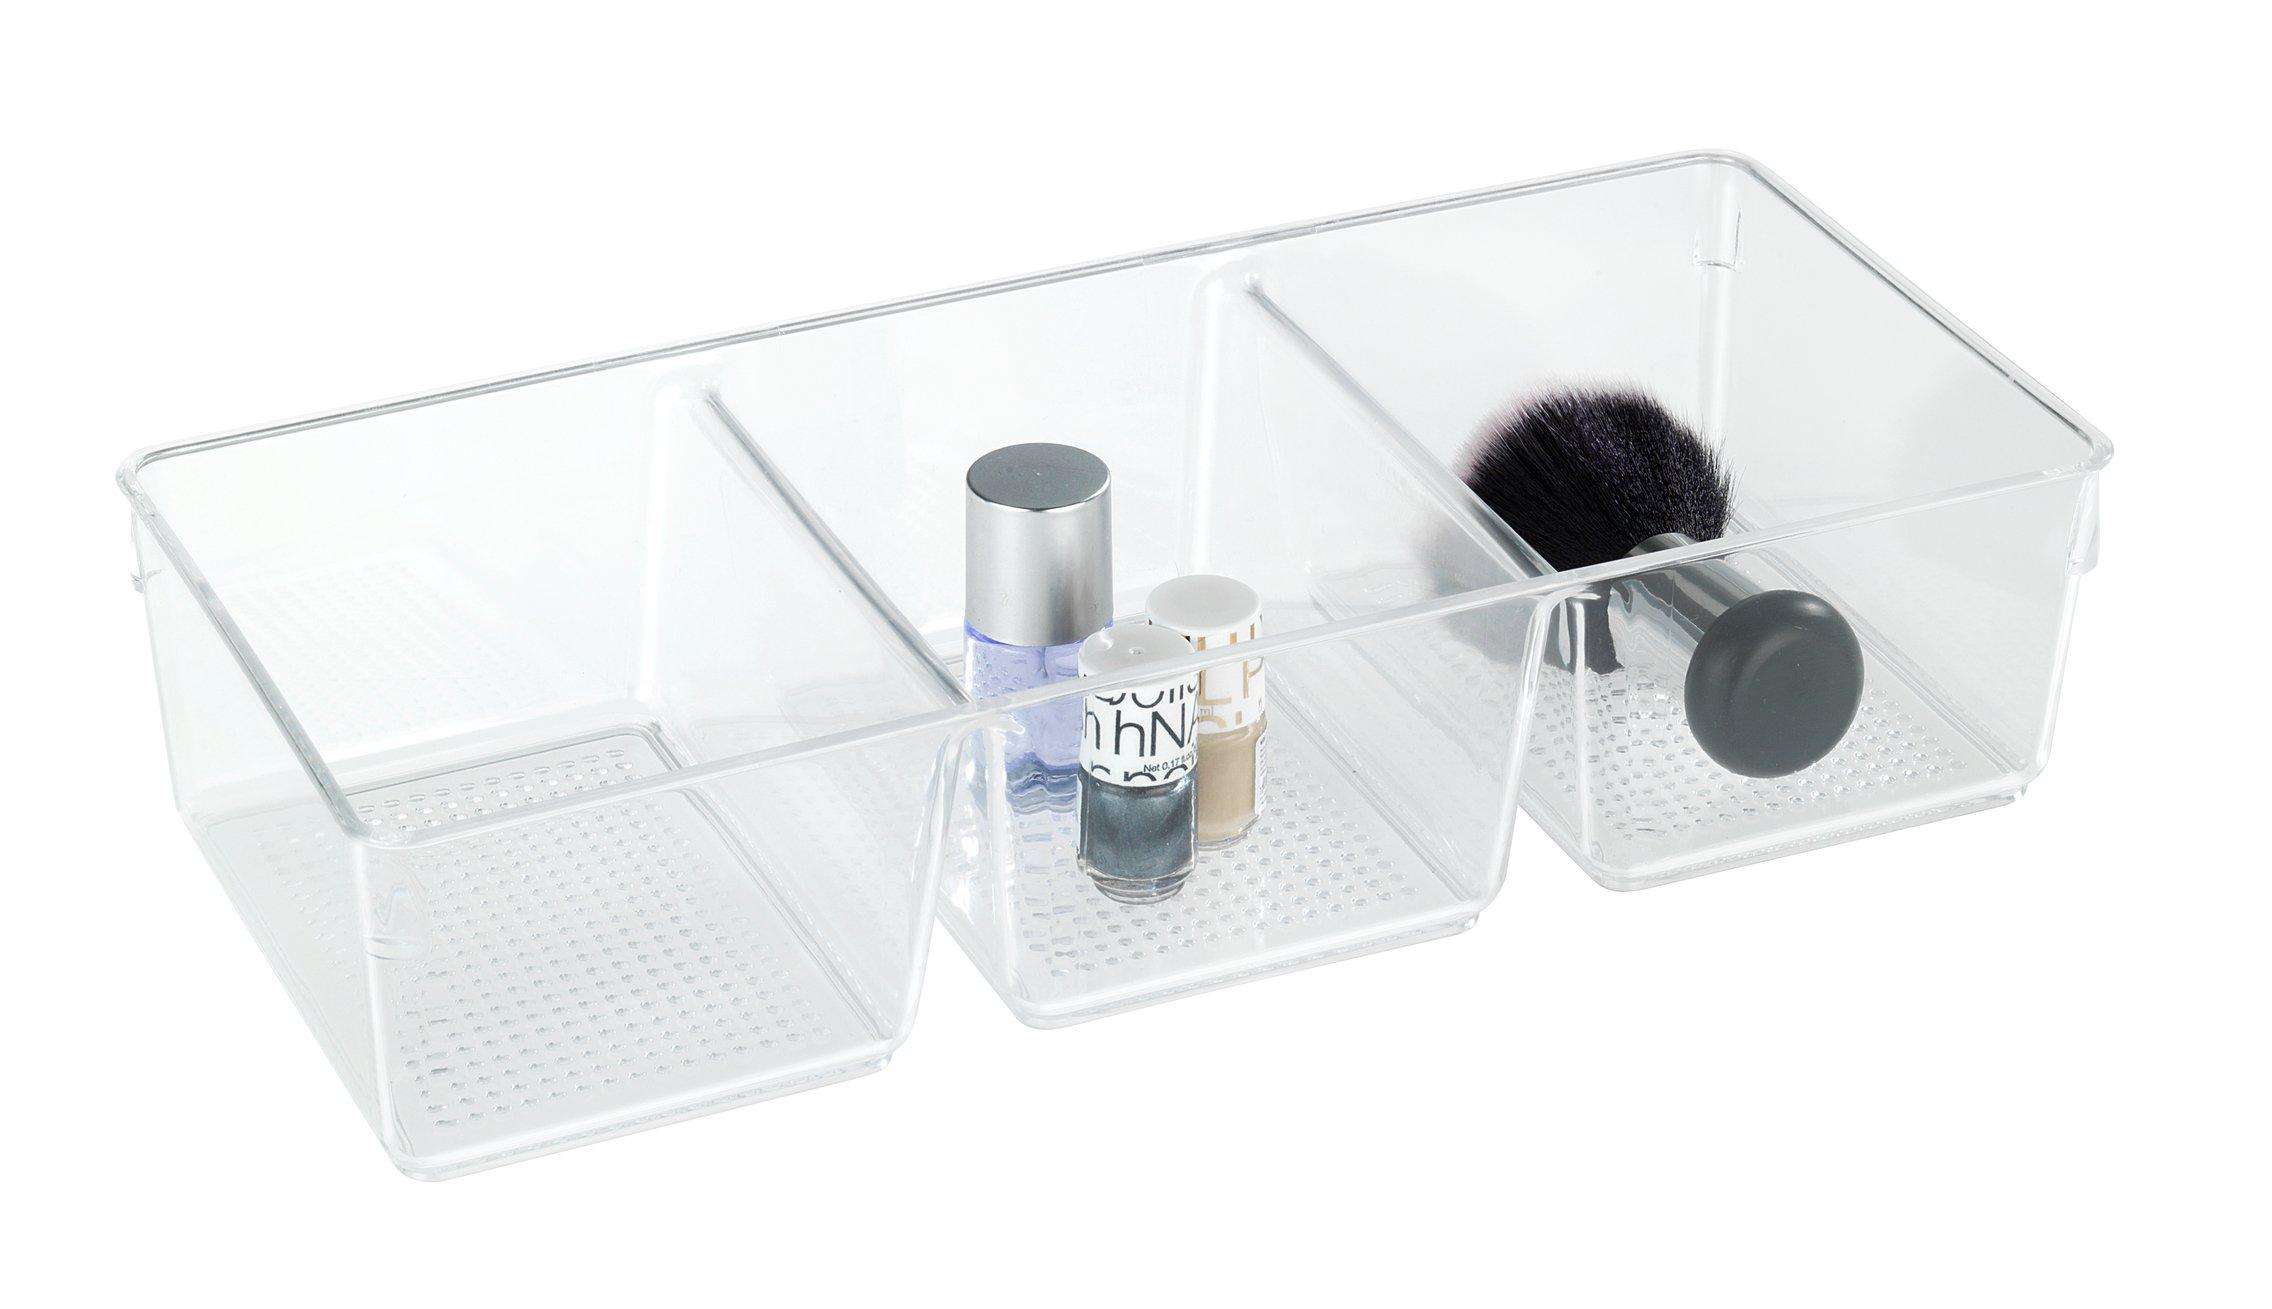 WENKO Cosmetic Organizer Femme 3 compartments, Acrylic 34 x 15 x 7.5 cm